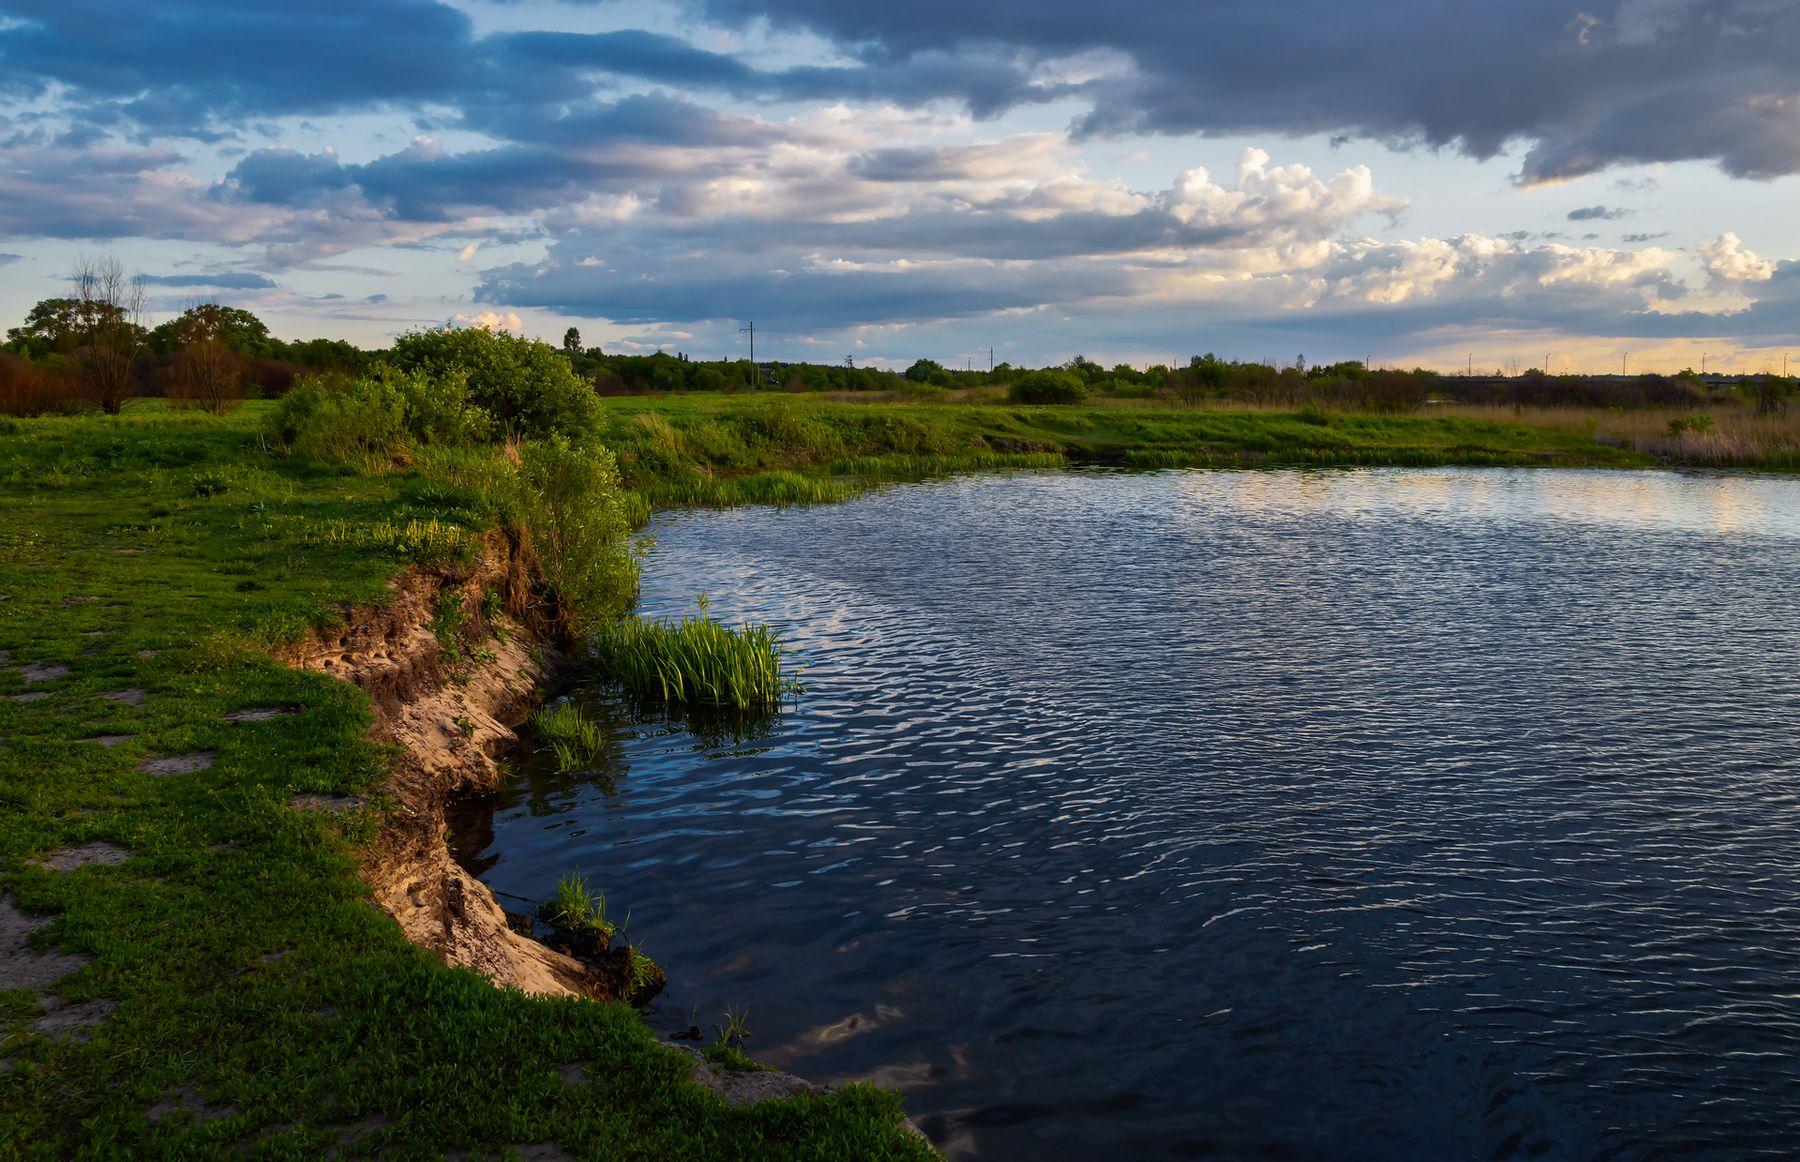 Темные воды Усманки природа пейзаж весна луг город Воронеж поселок Сомово Боровое река Усманка солнце закат вечер